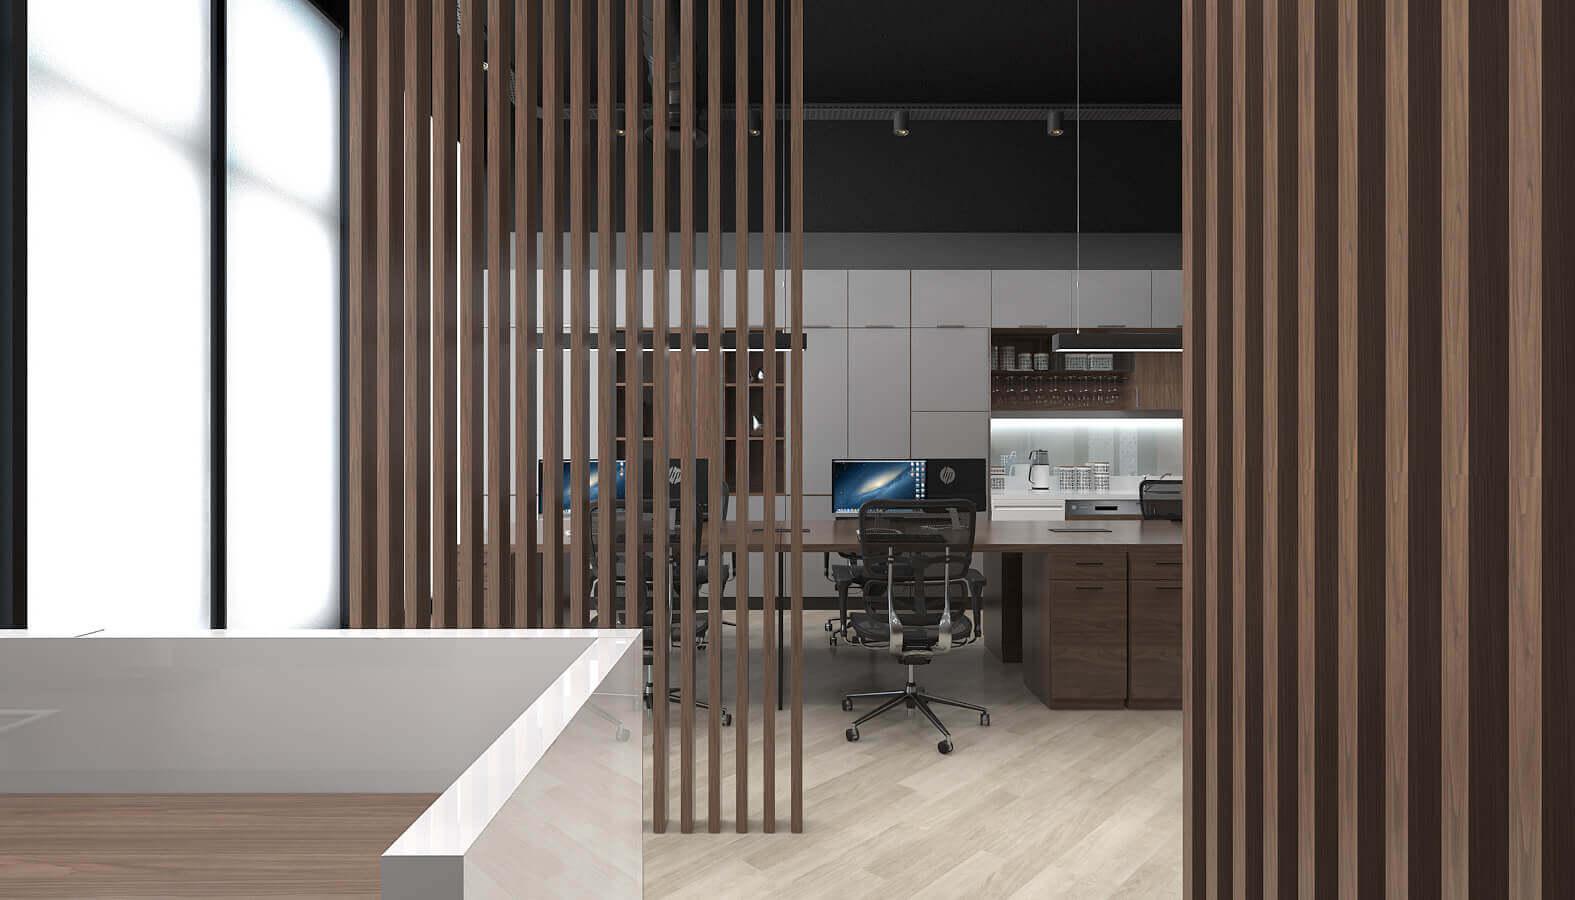 Wc furniture 3771 Tanitek Offices